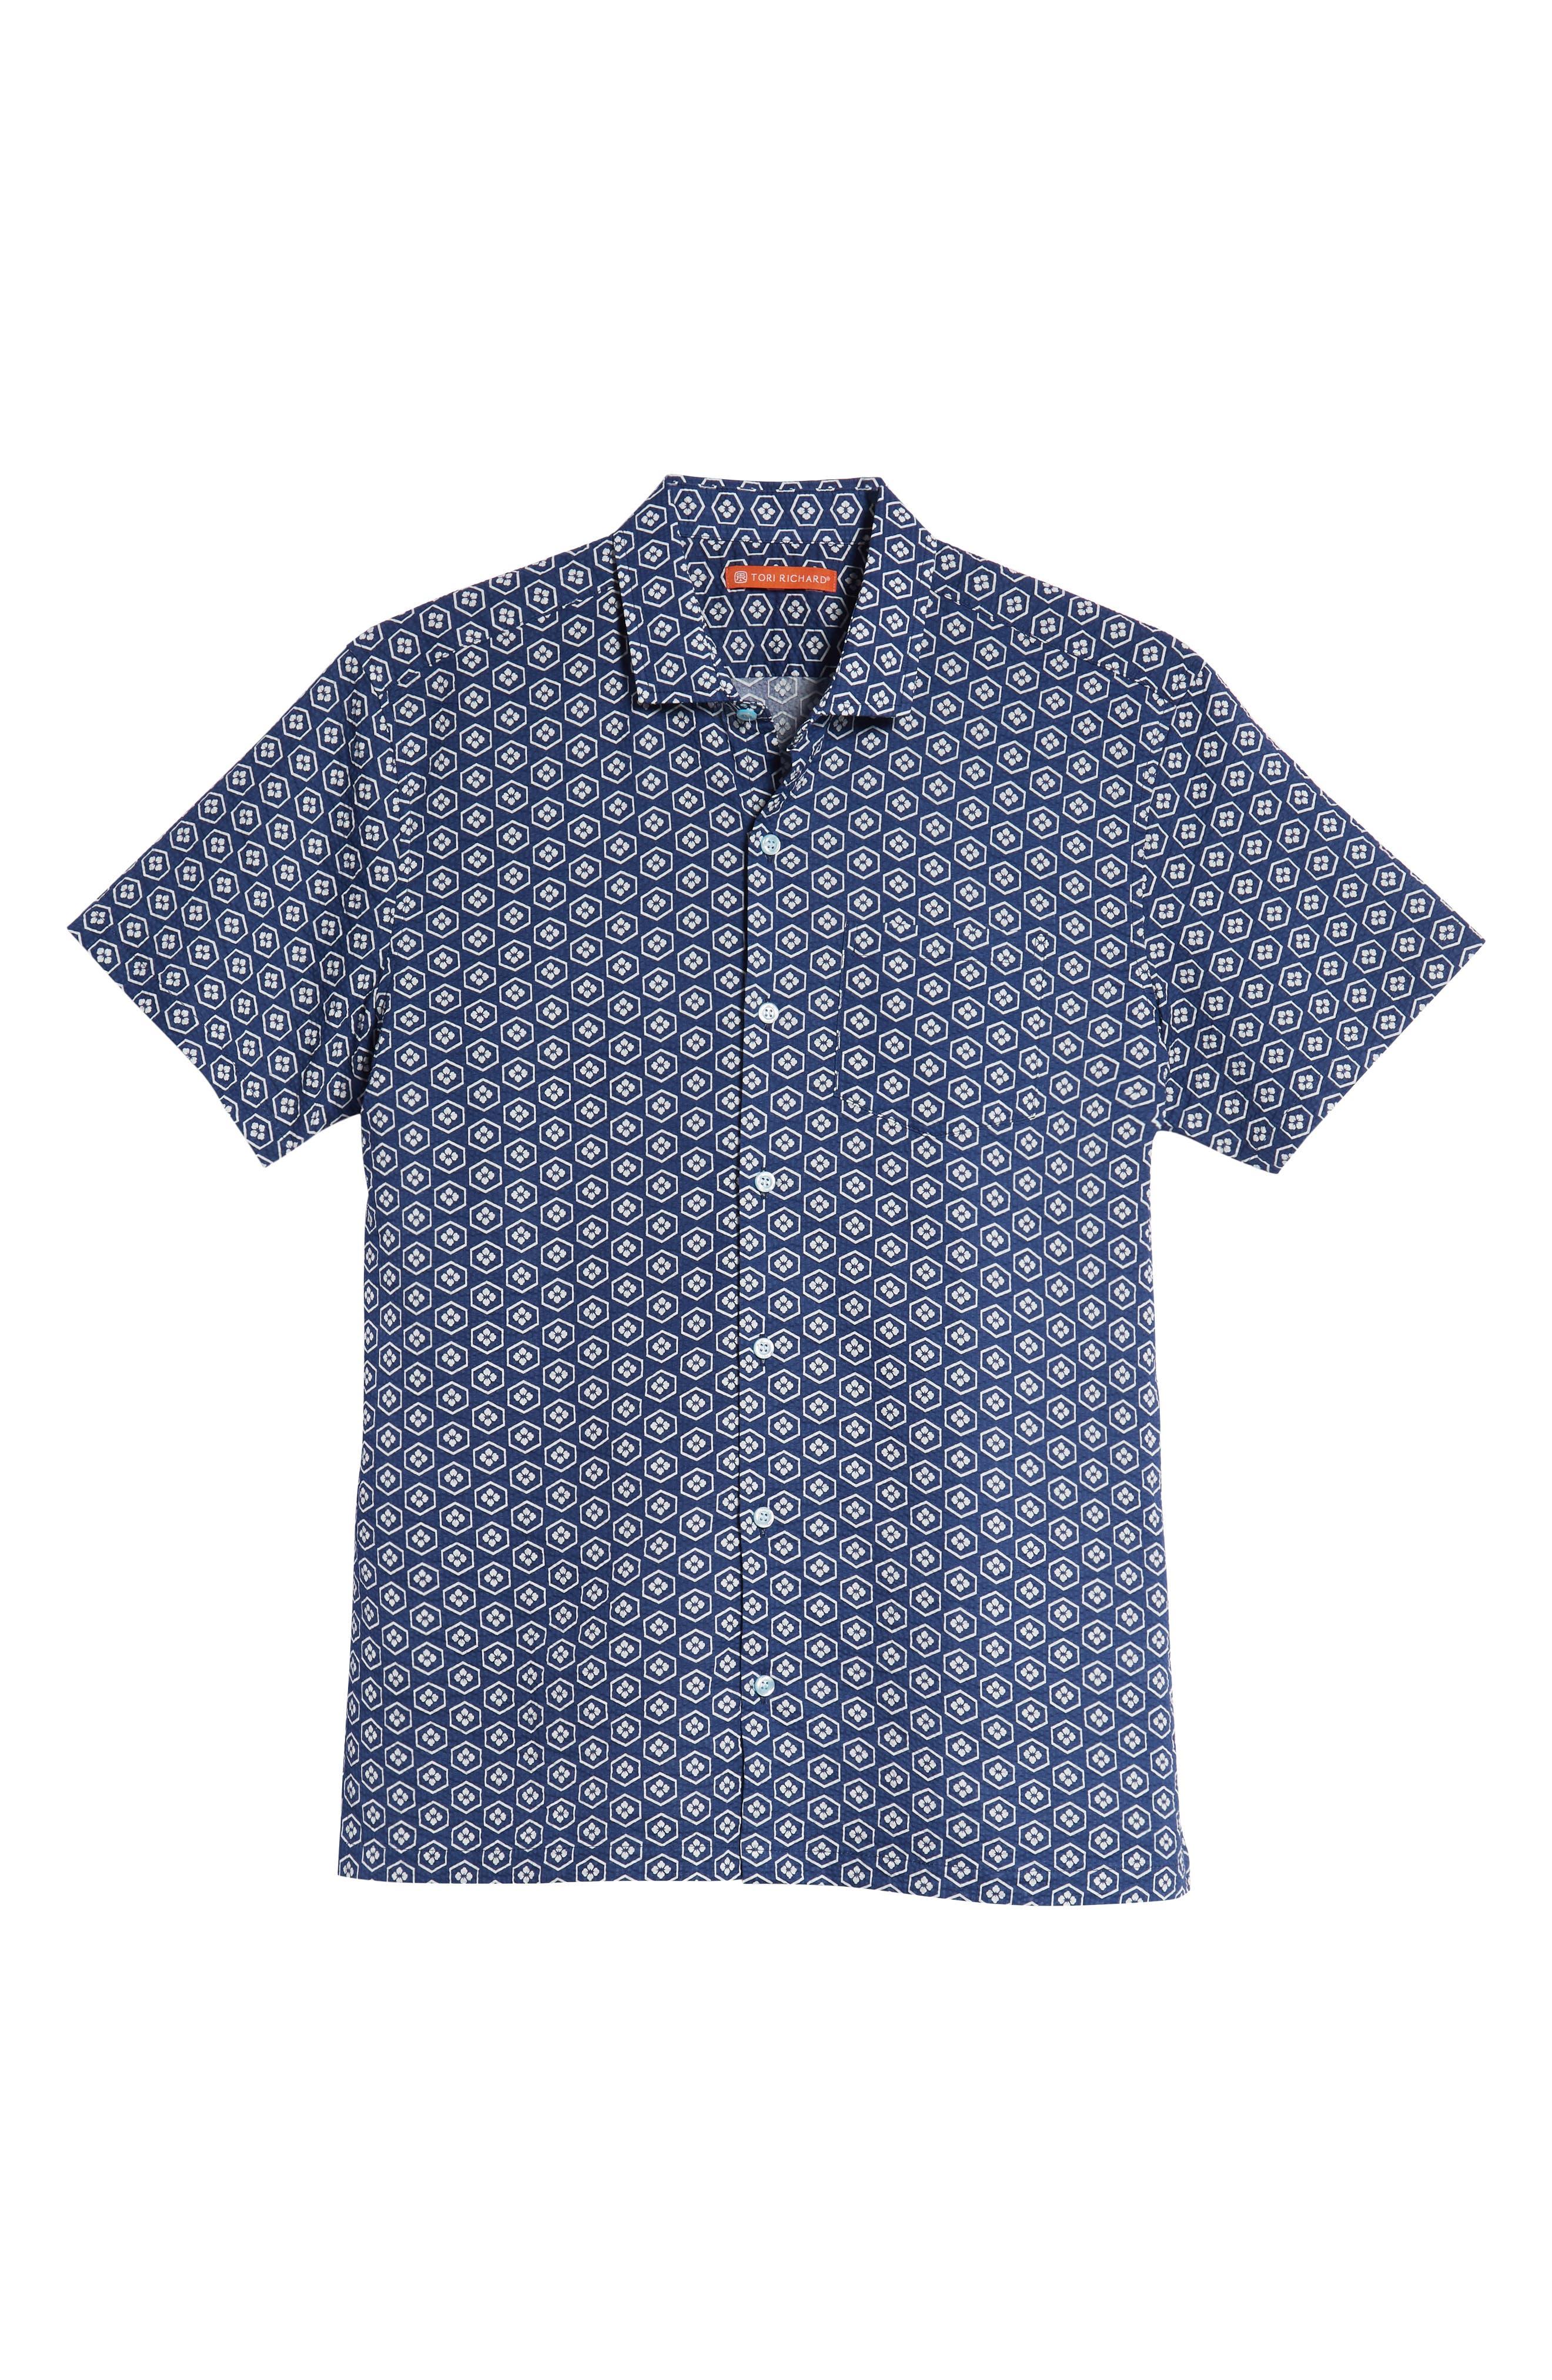 Regular Fit Print Sport Shirt,                             Alternate thumbnail 5, color,                             NAVY